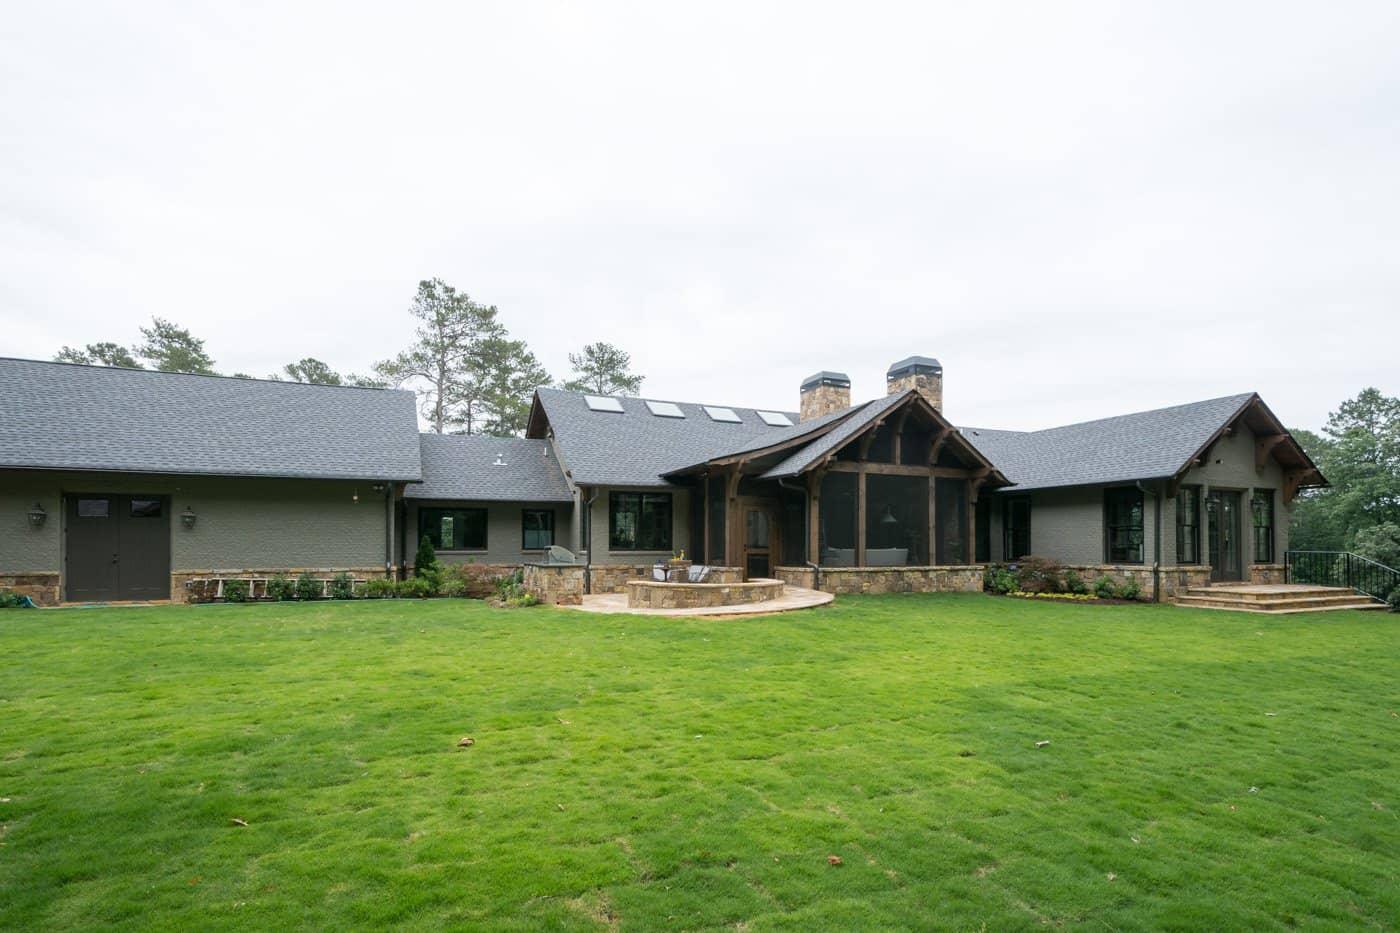 contemporary-ranch-style-house-exterior